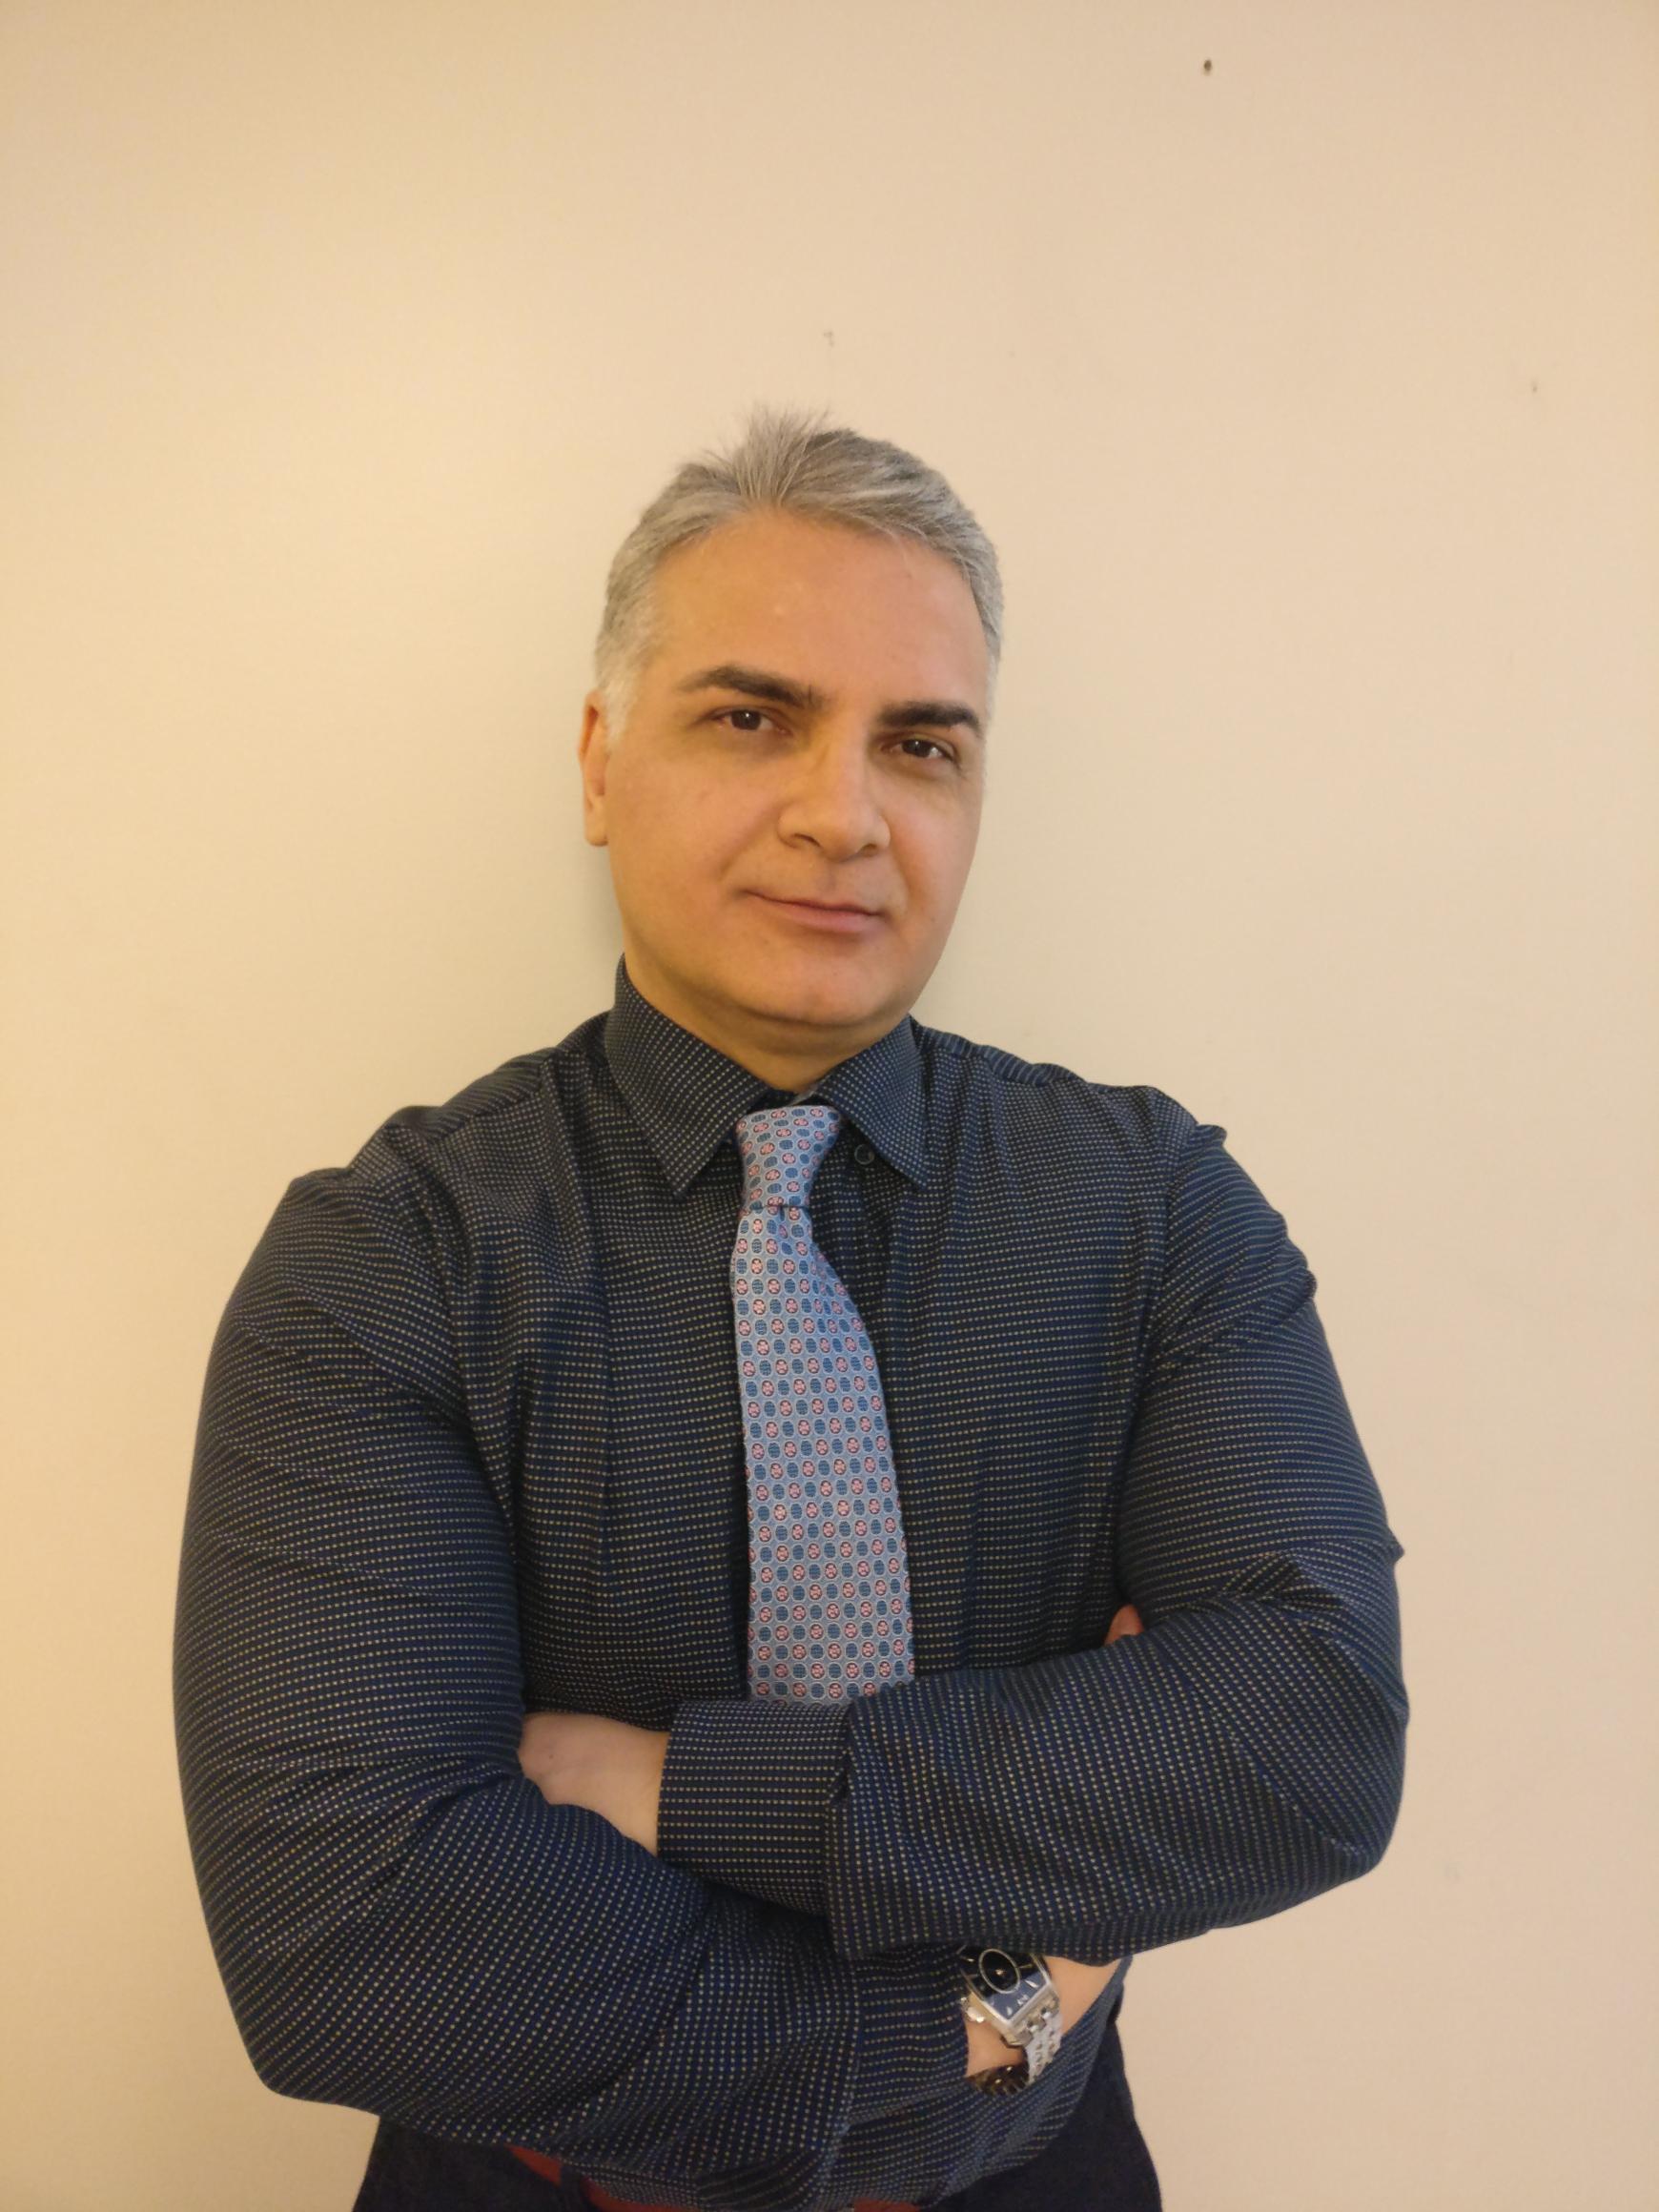 Reza Akhlaghi